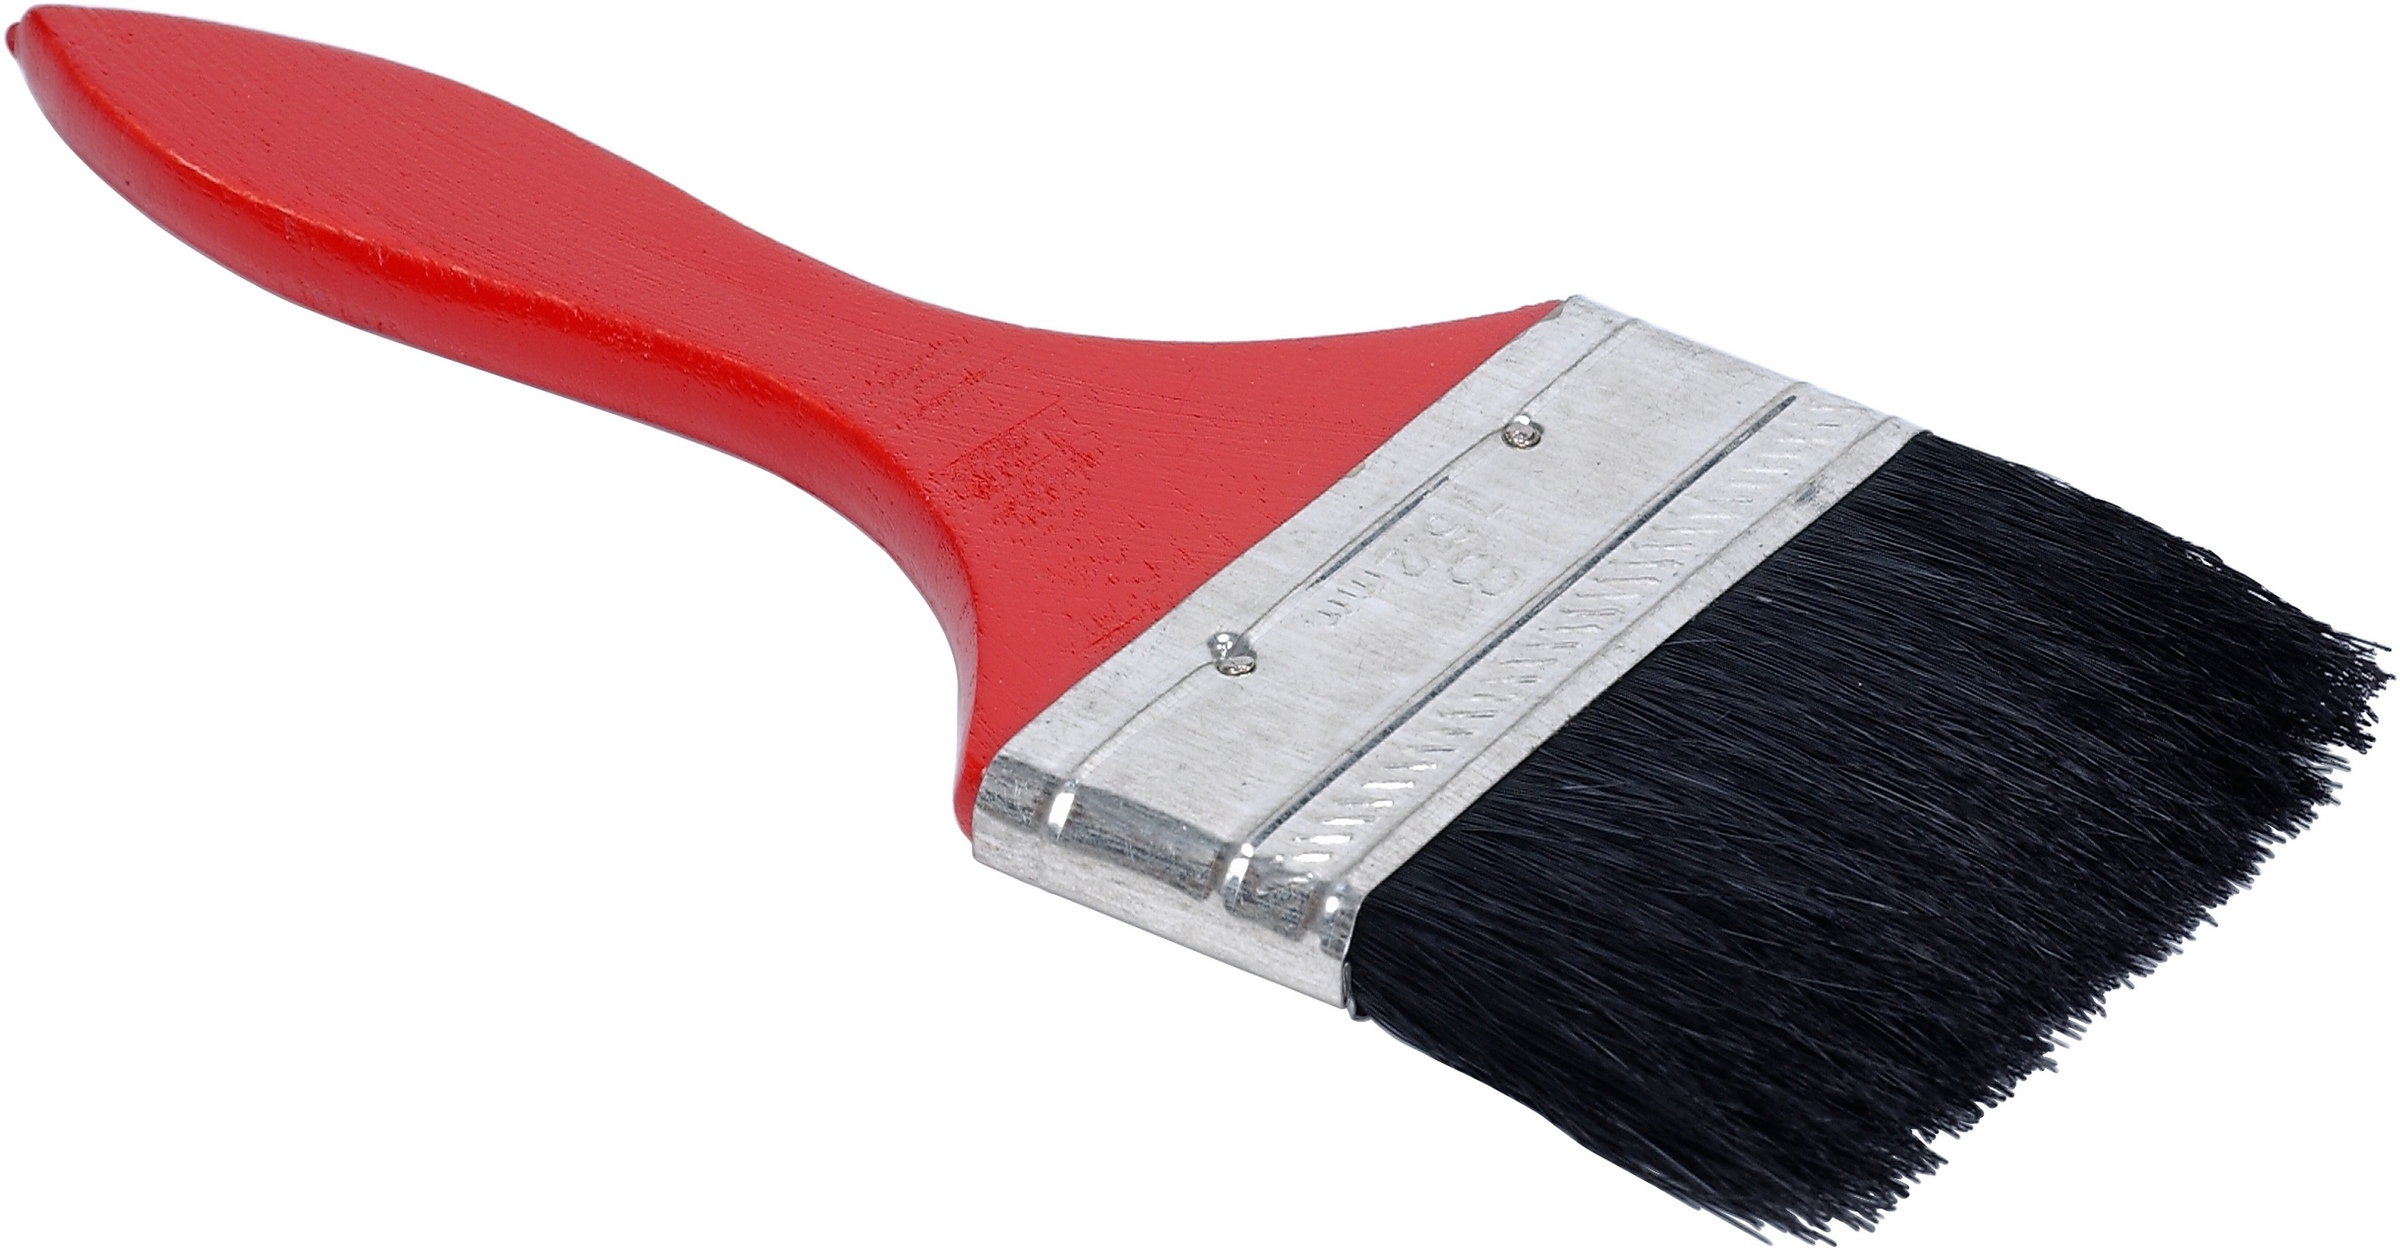 Delta Paint Brushes